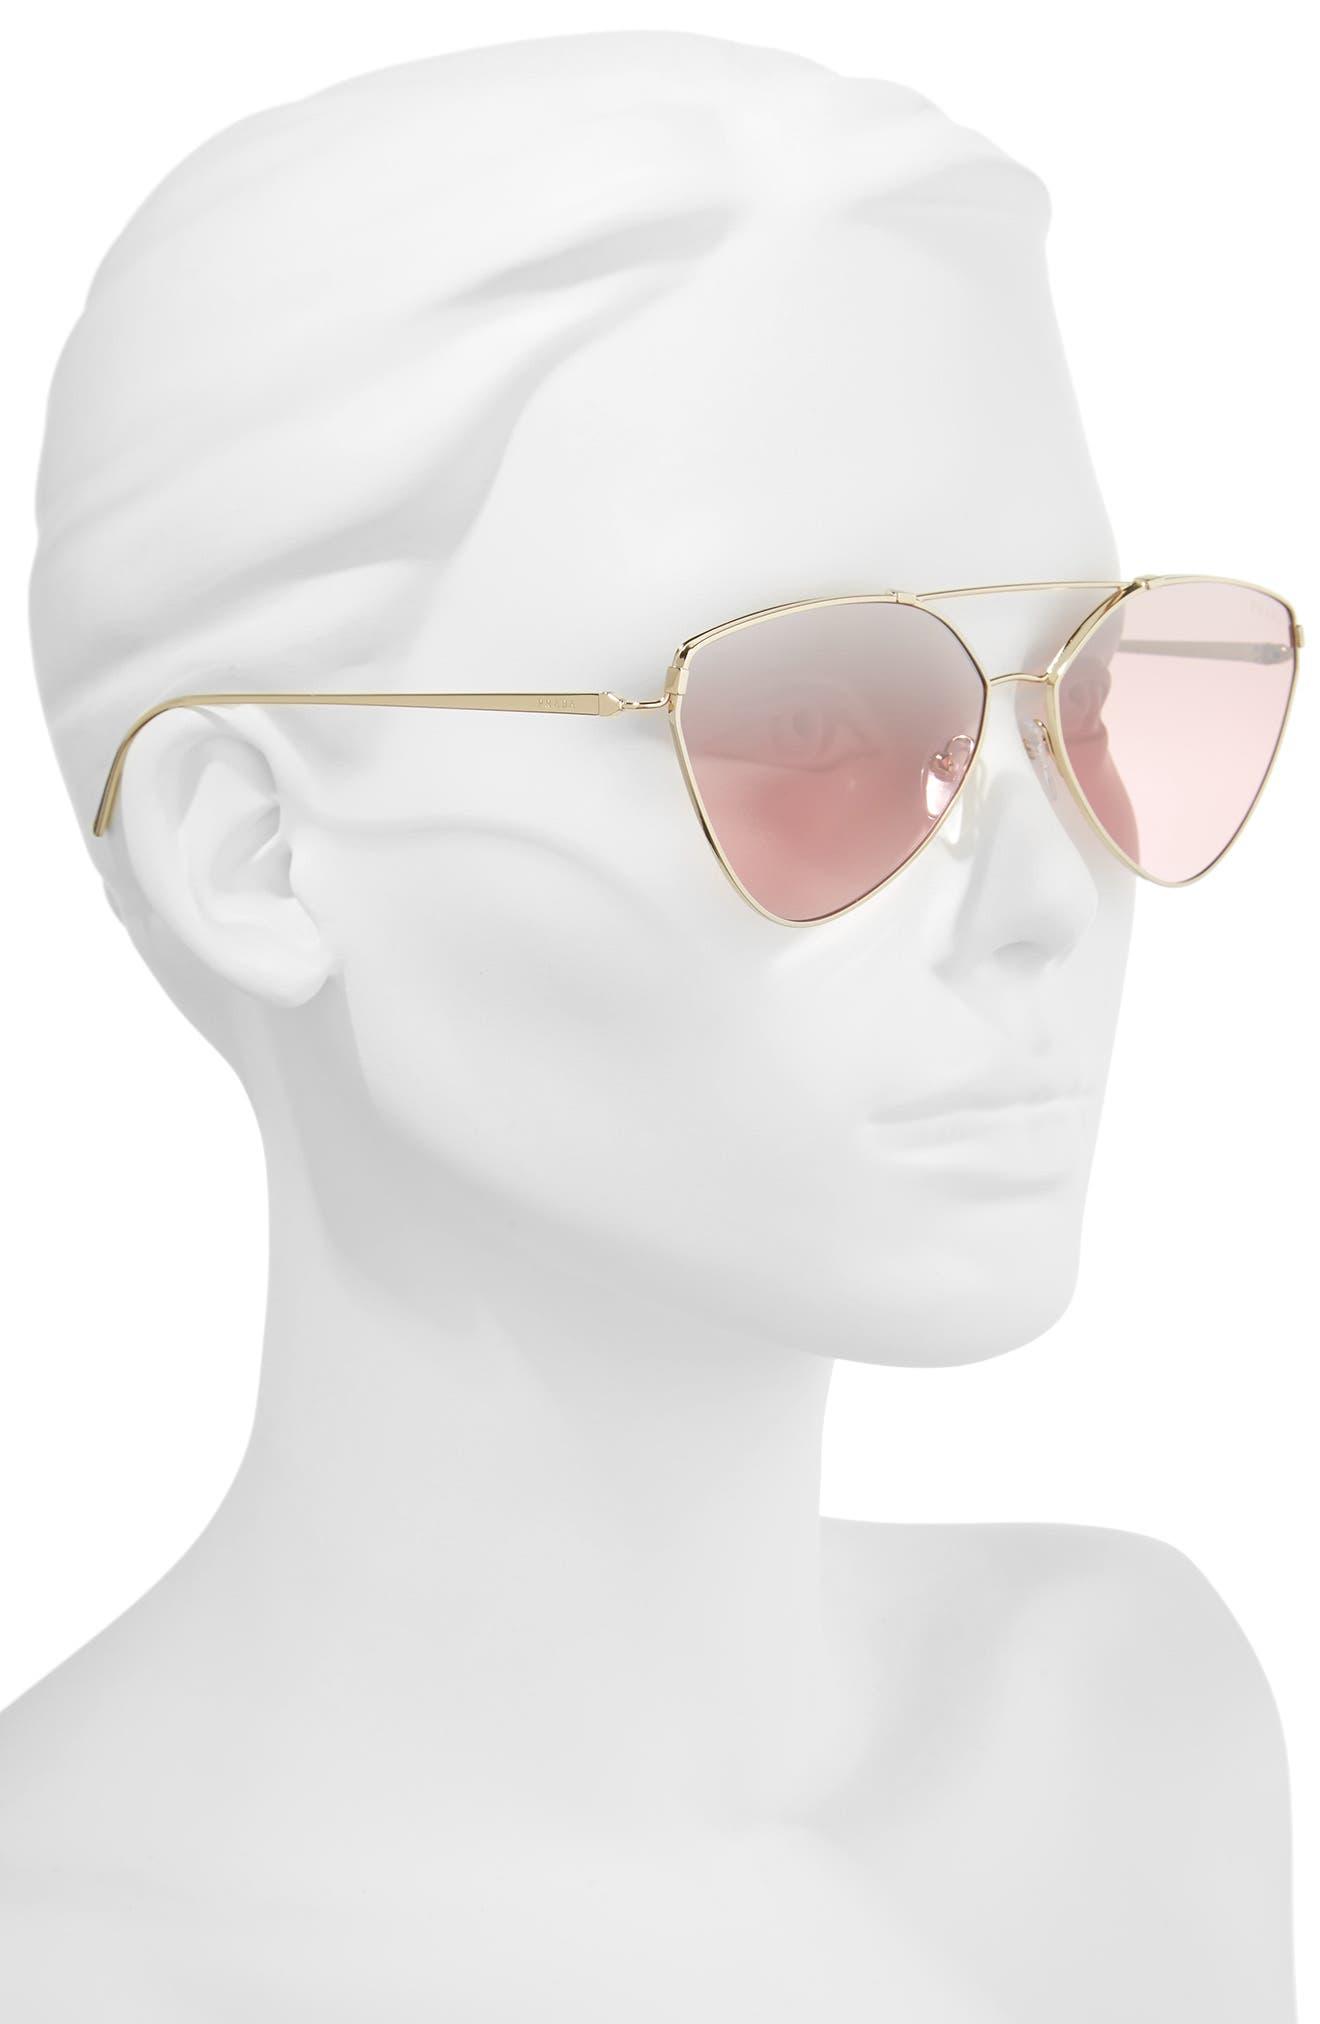 62mm Gradient Aviator Sunglasses,                             Alternate thumbnail 2, color,                             Pale Gold